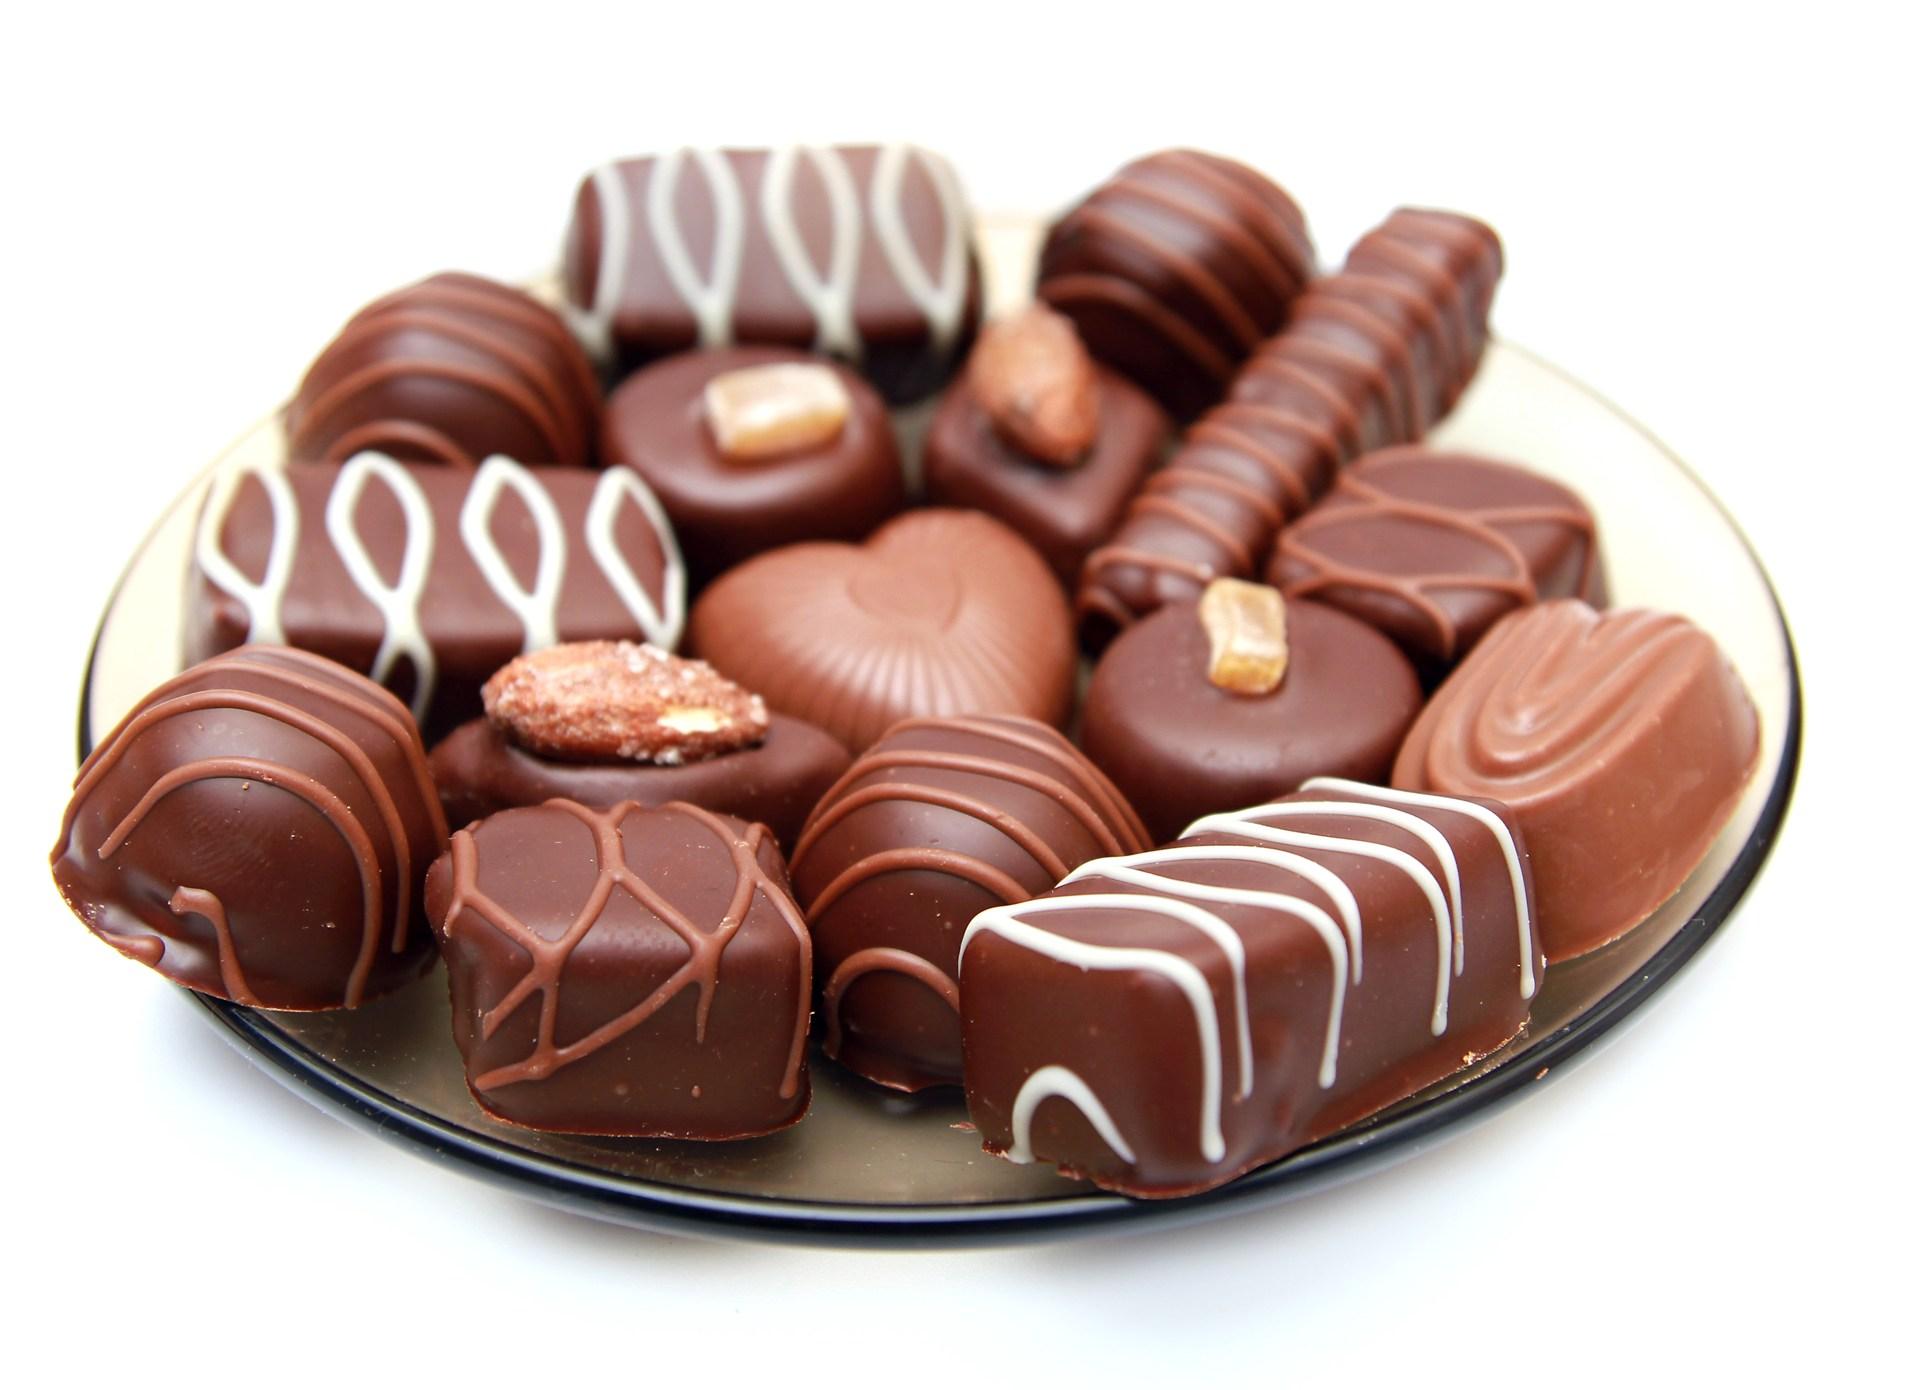 hinh nen chocolate 43